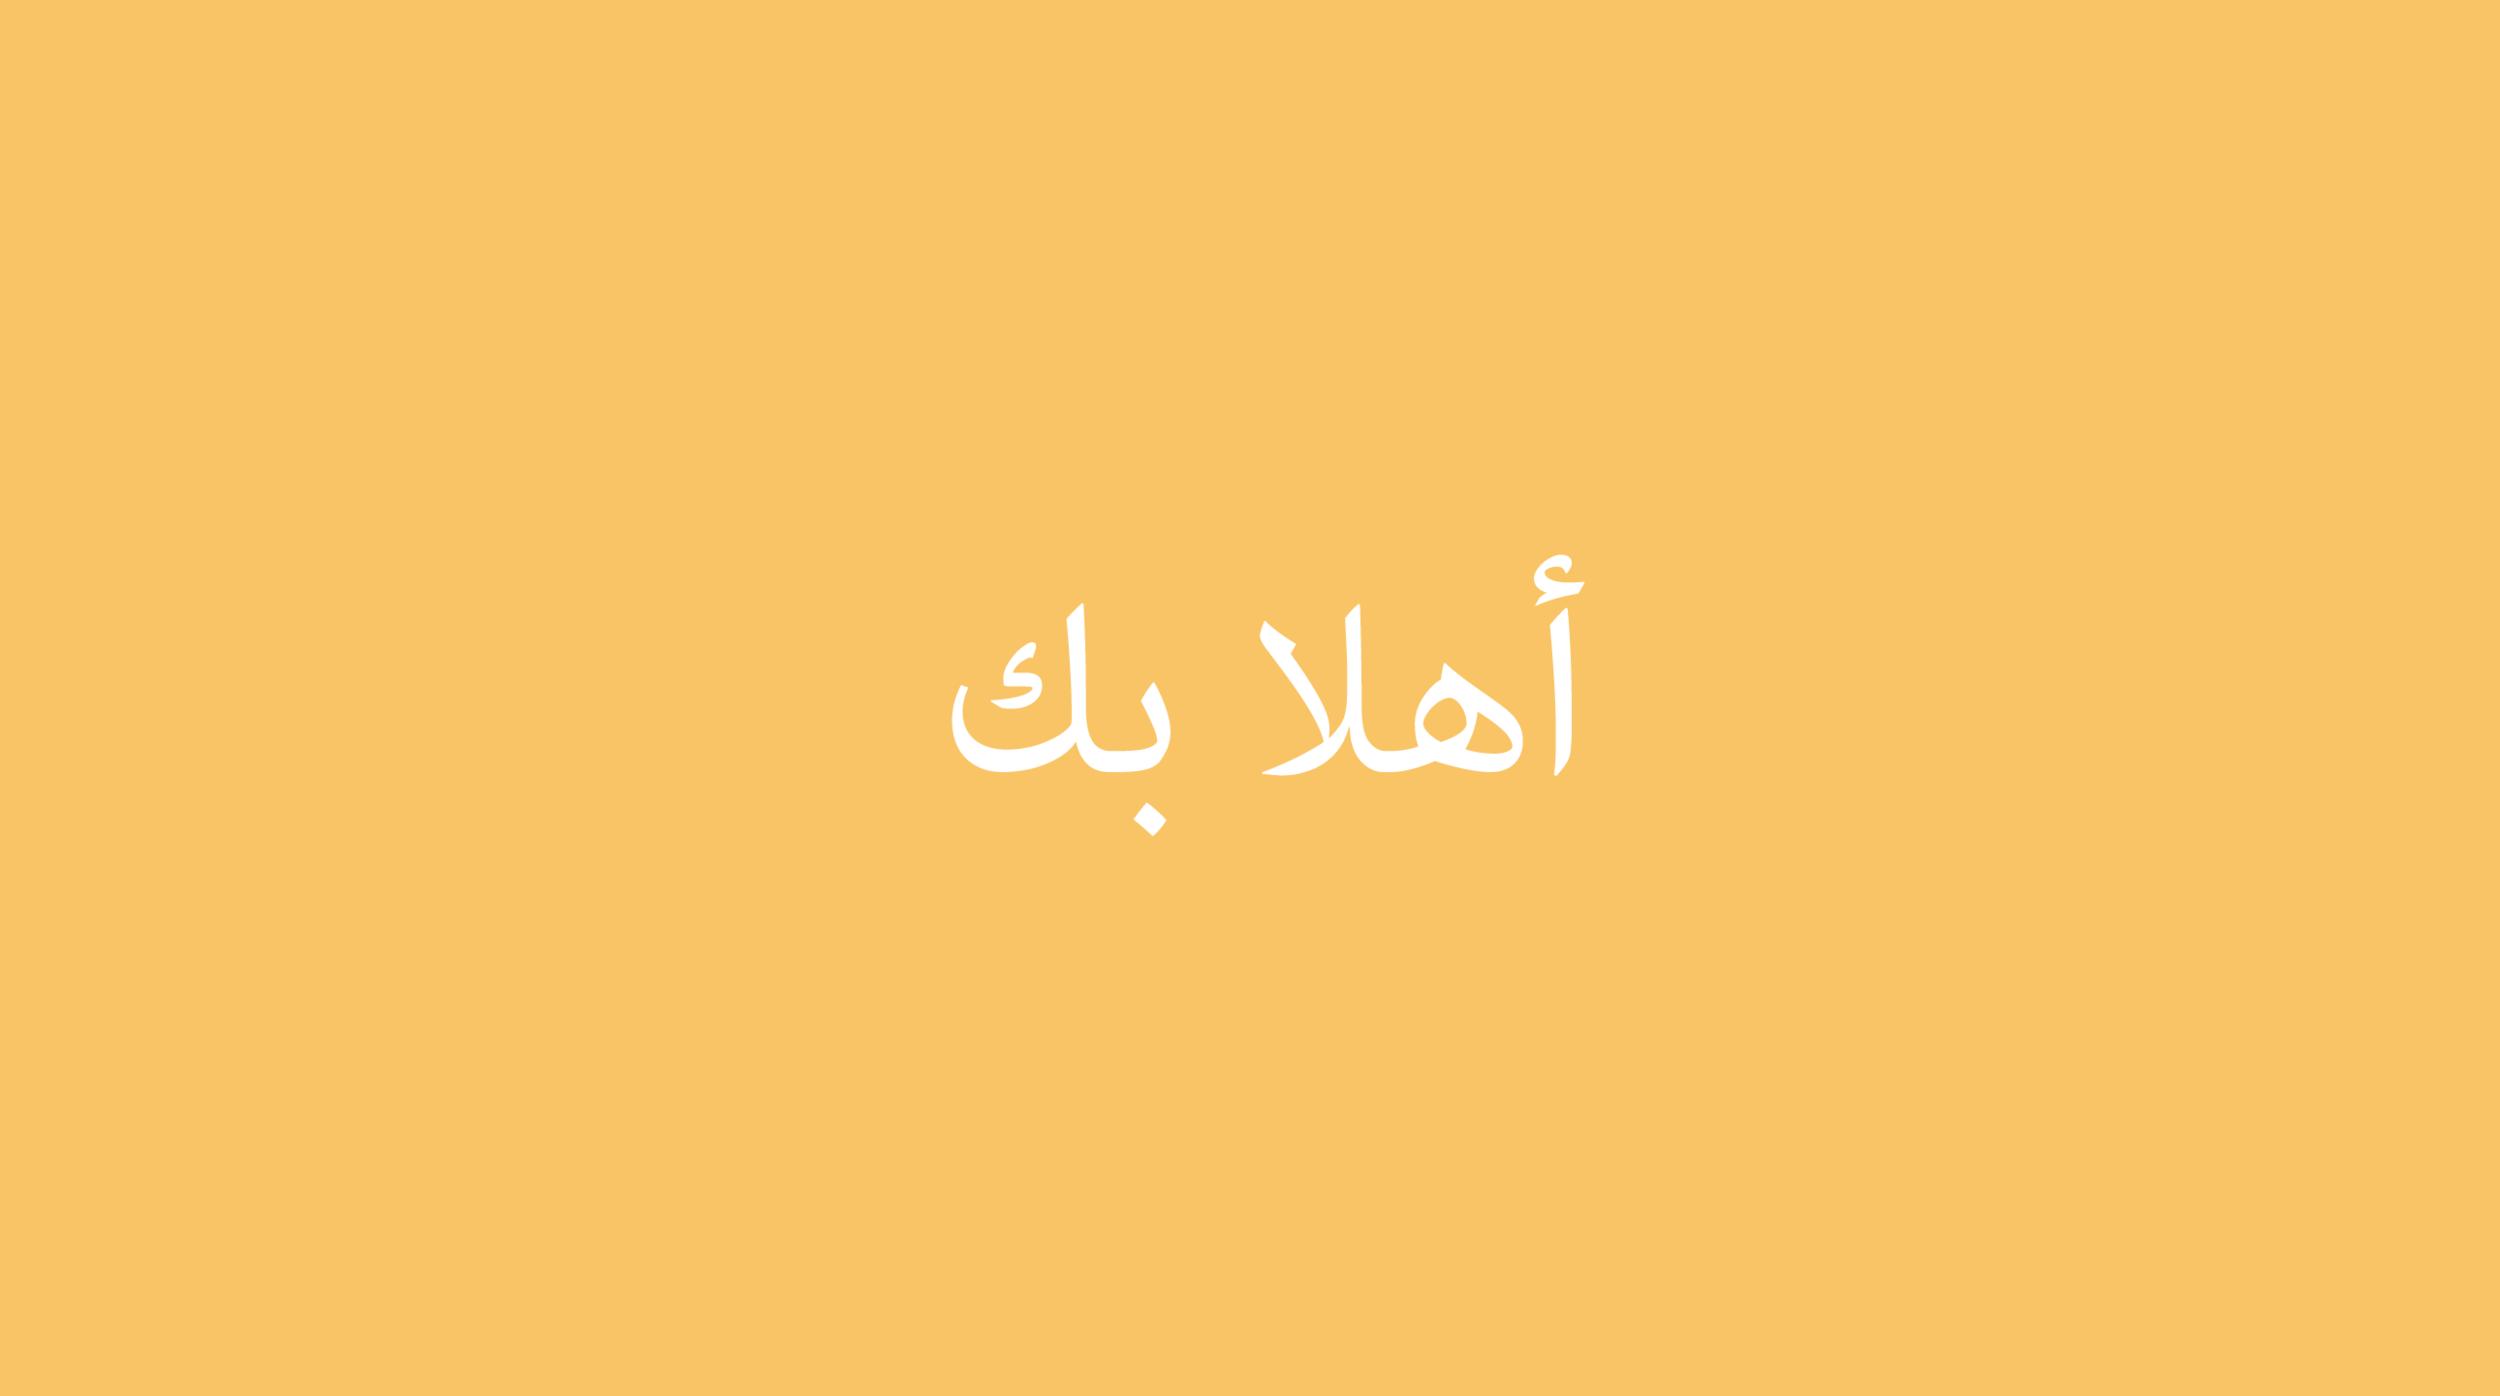 2_WelcomeBanner_Arabic_Correct.png